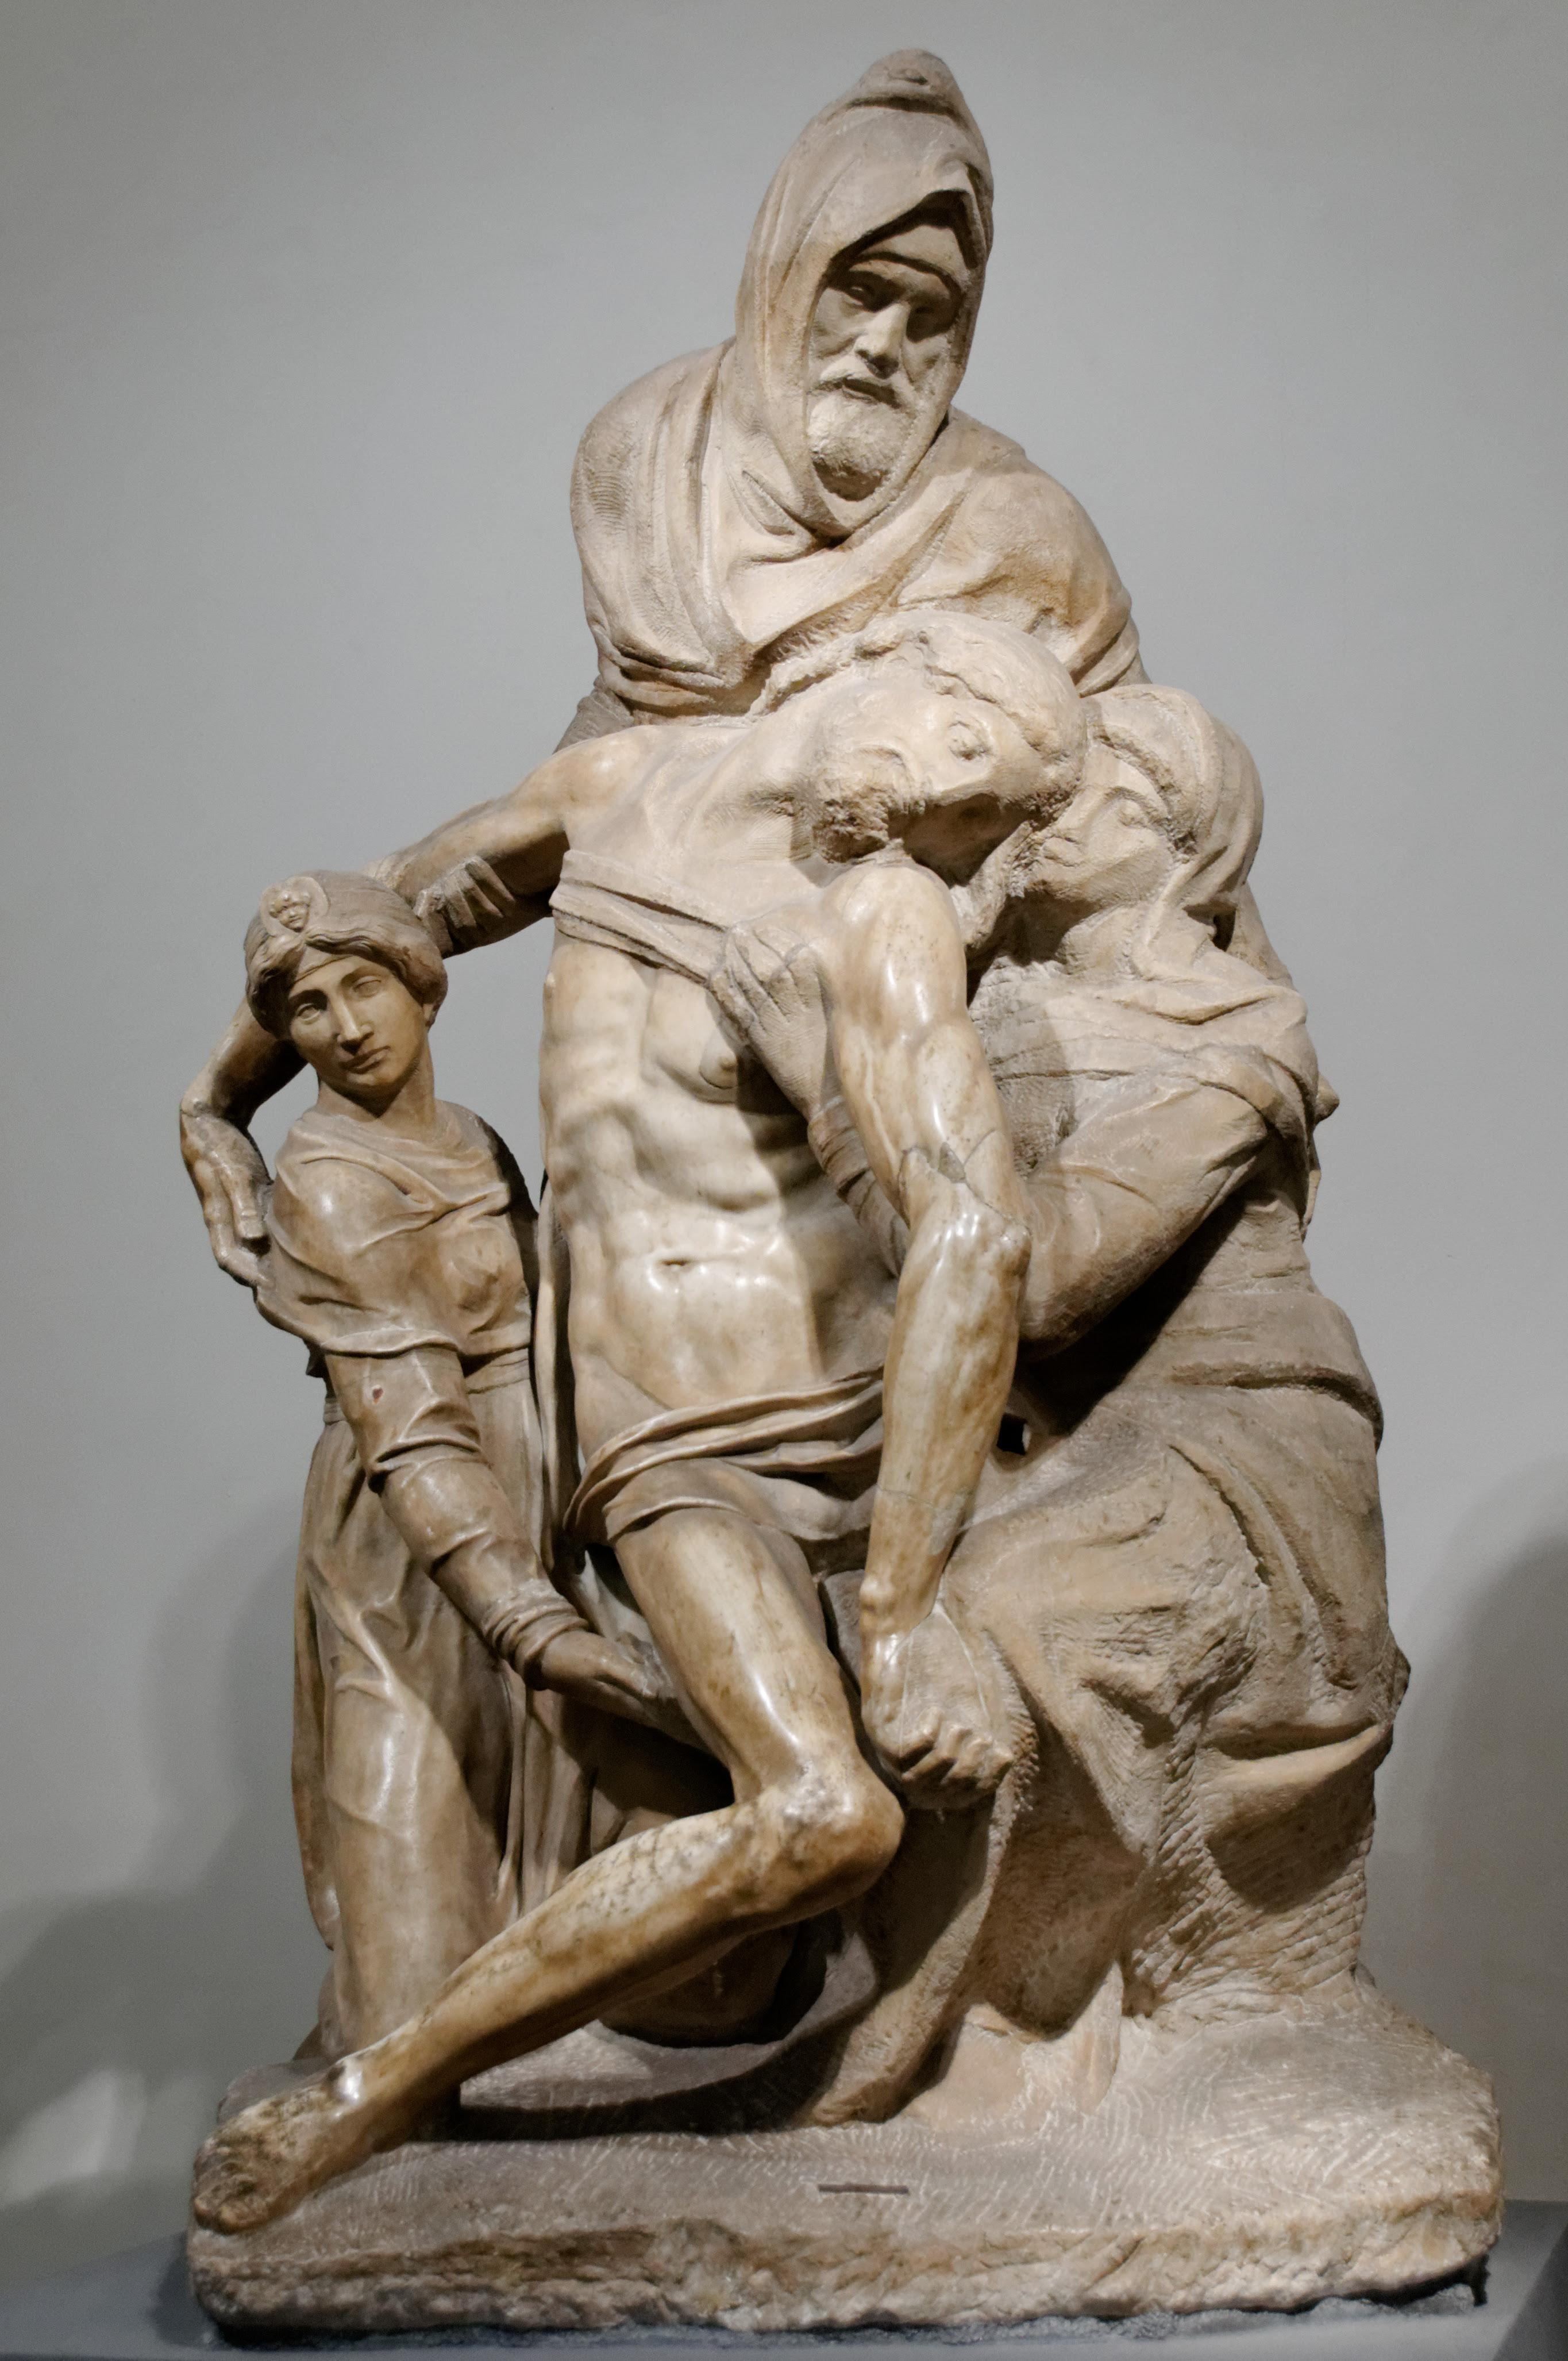 The Deposition - Michelangelo